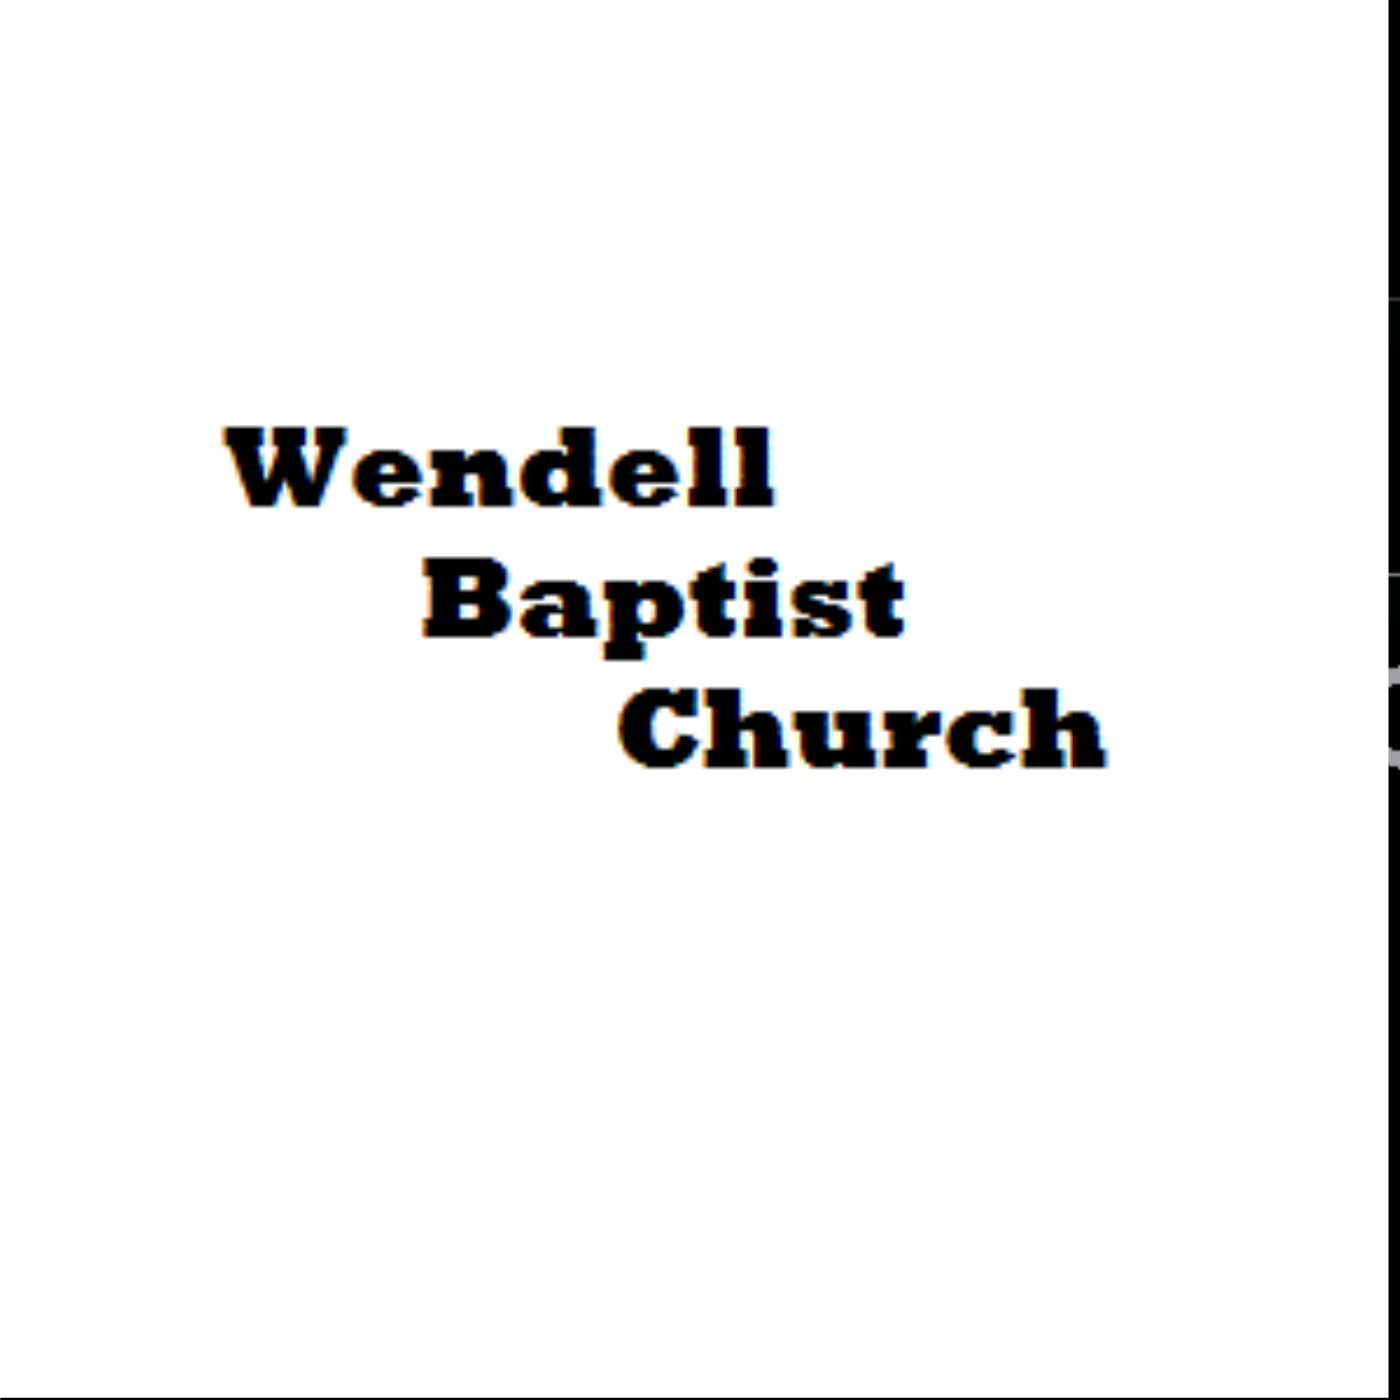 Wendell Baptist Church